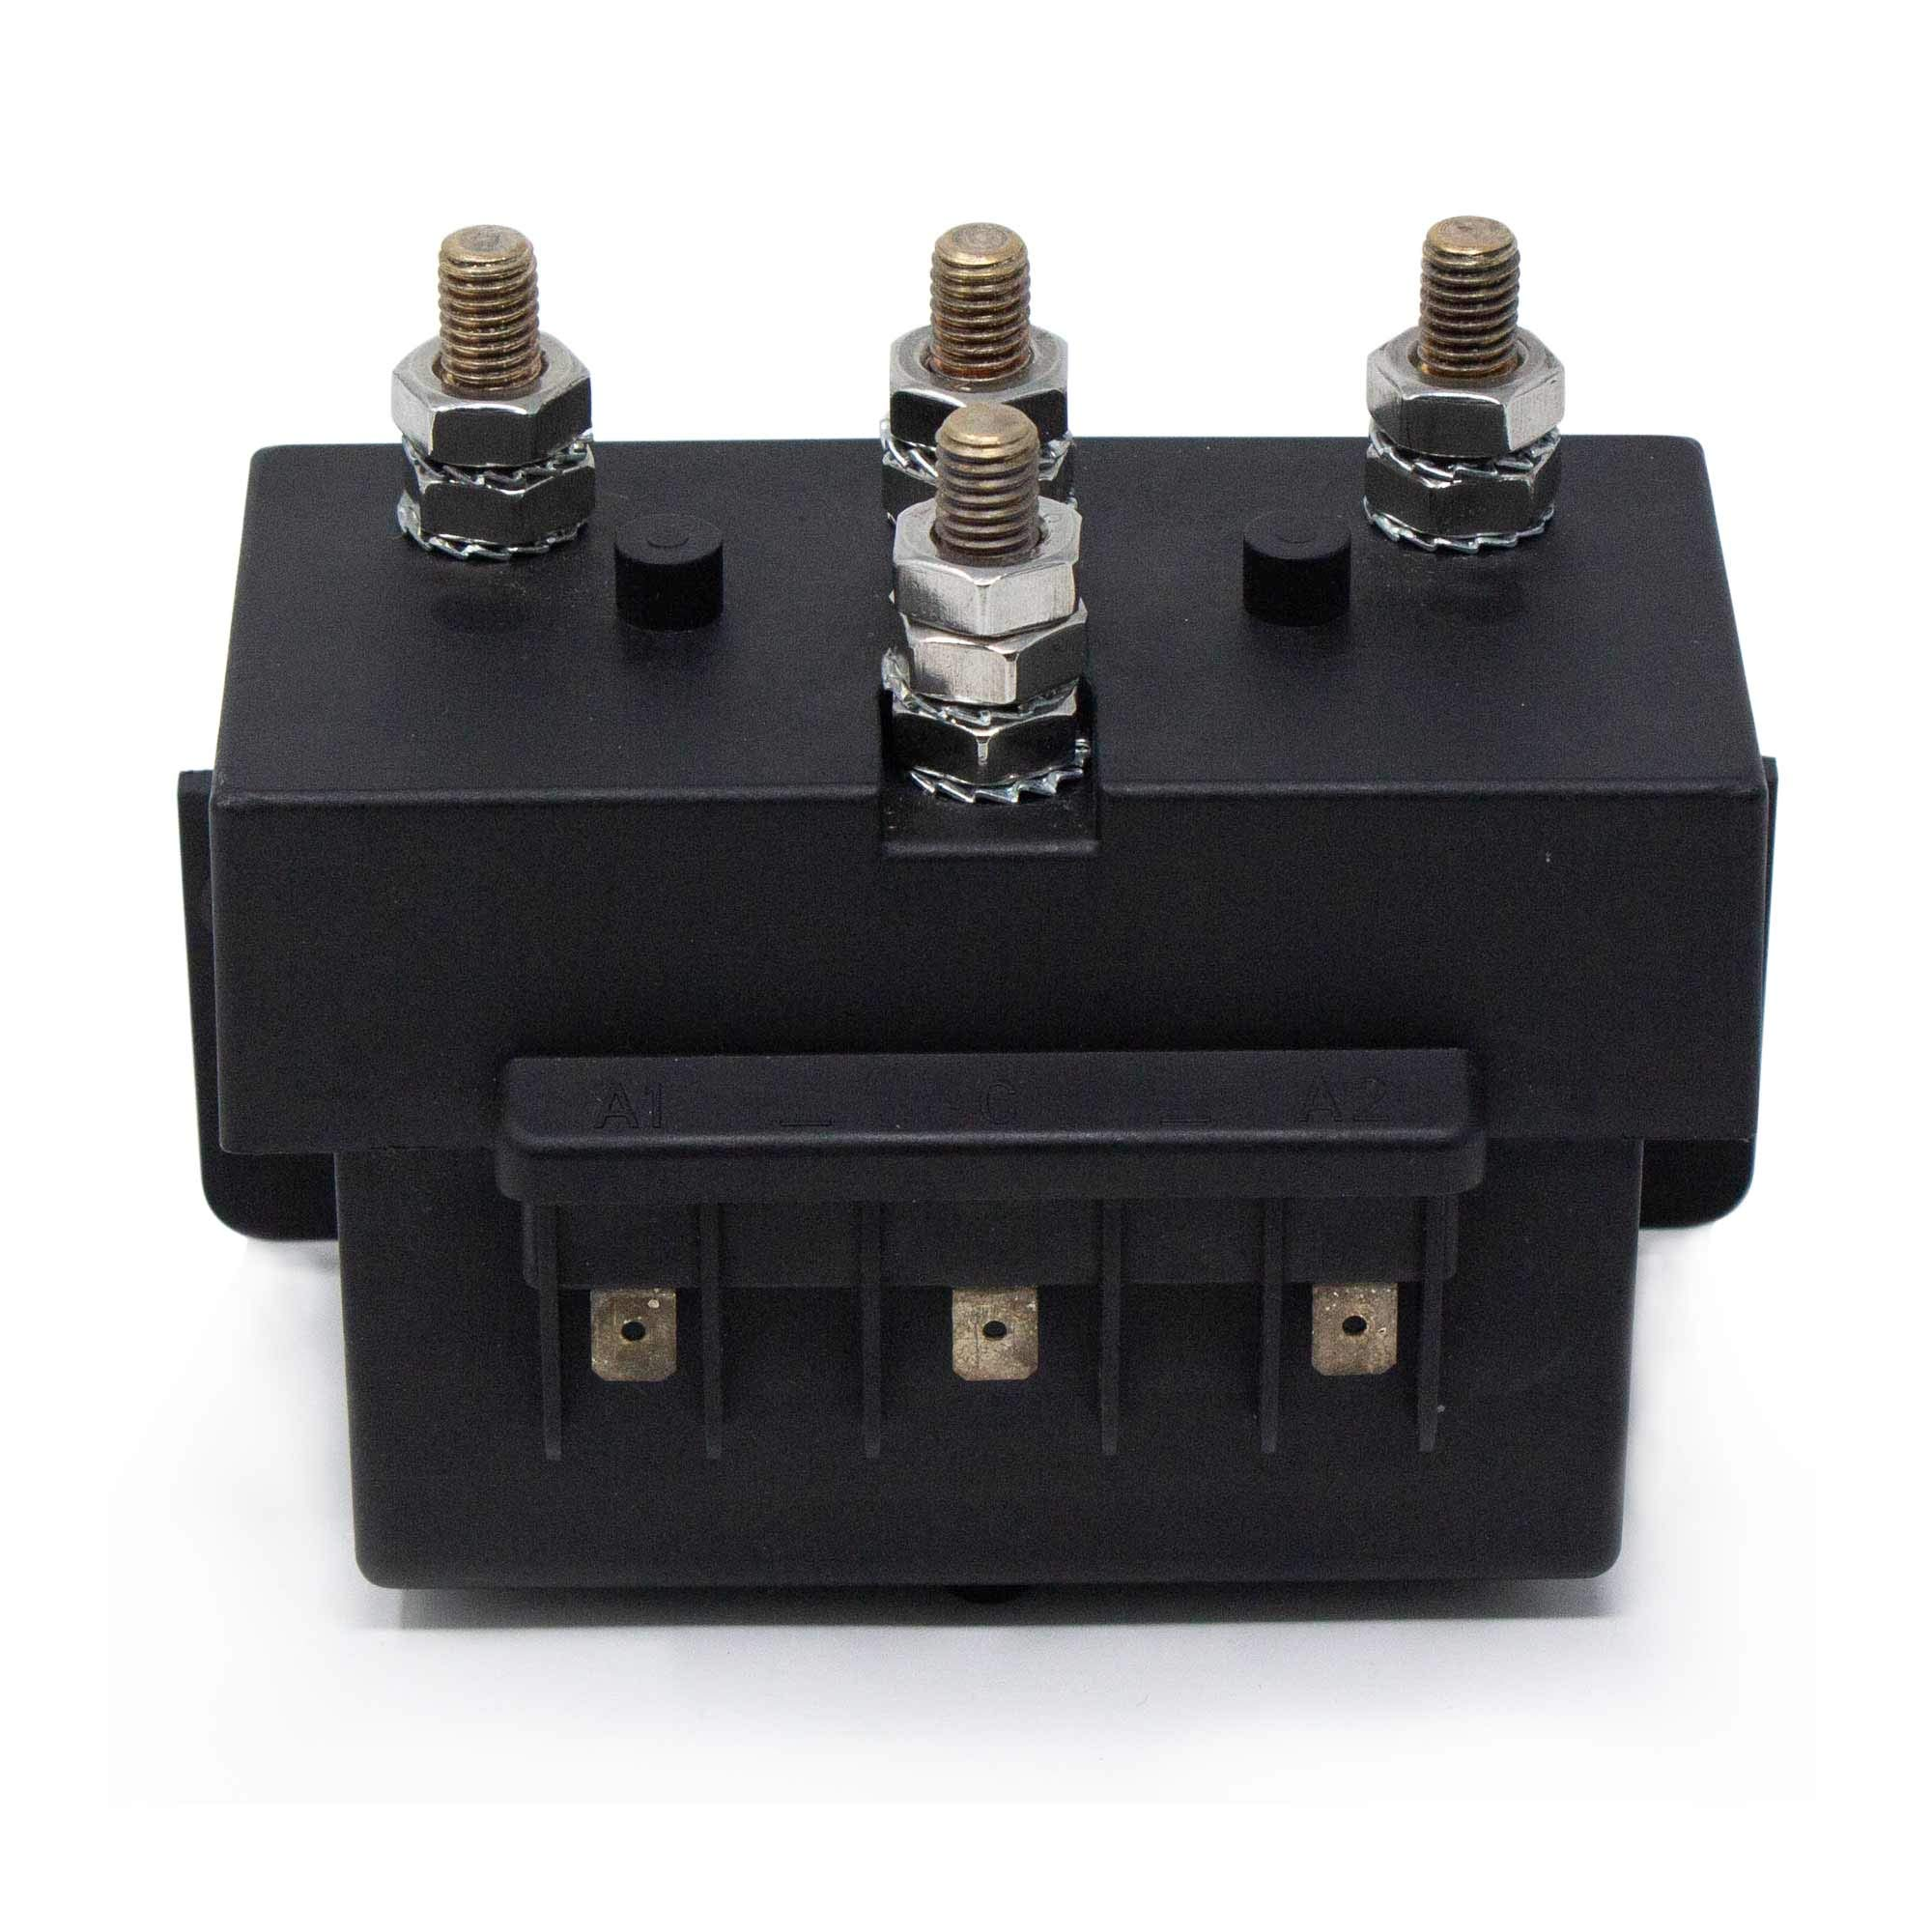 Five Oceans Dual Direction Windlass Solenoid 2-Wire Motors Reversing Control Box, 12V FO-3292